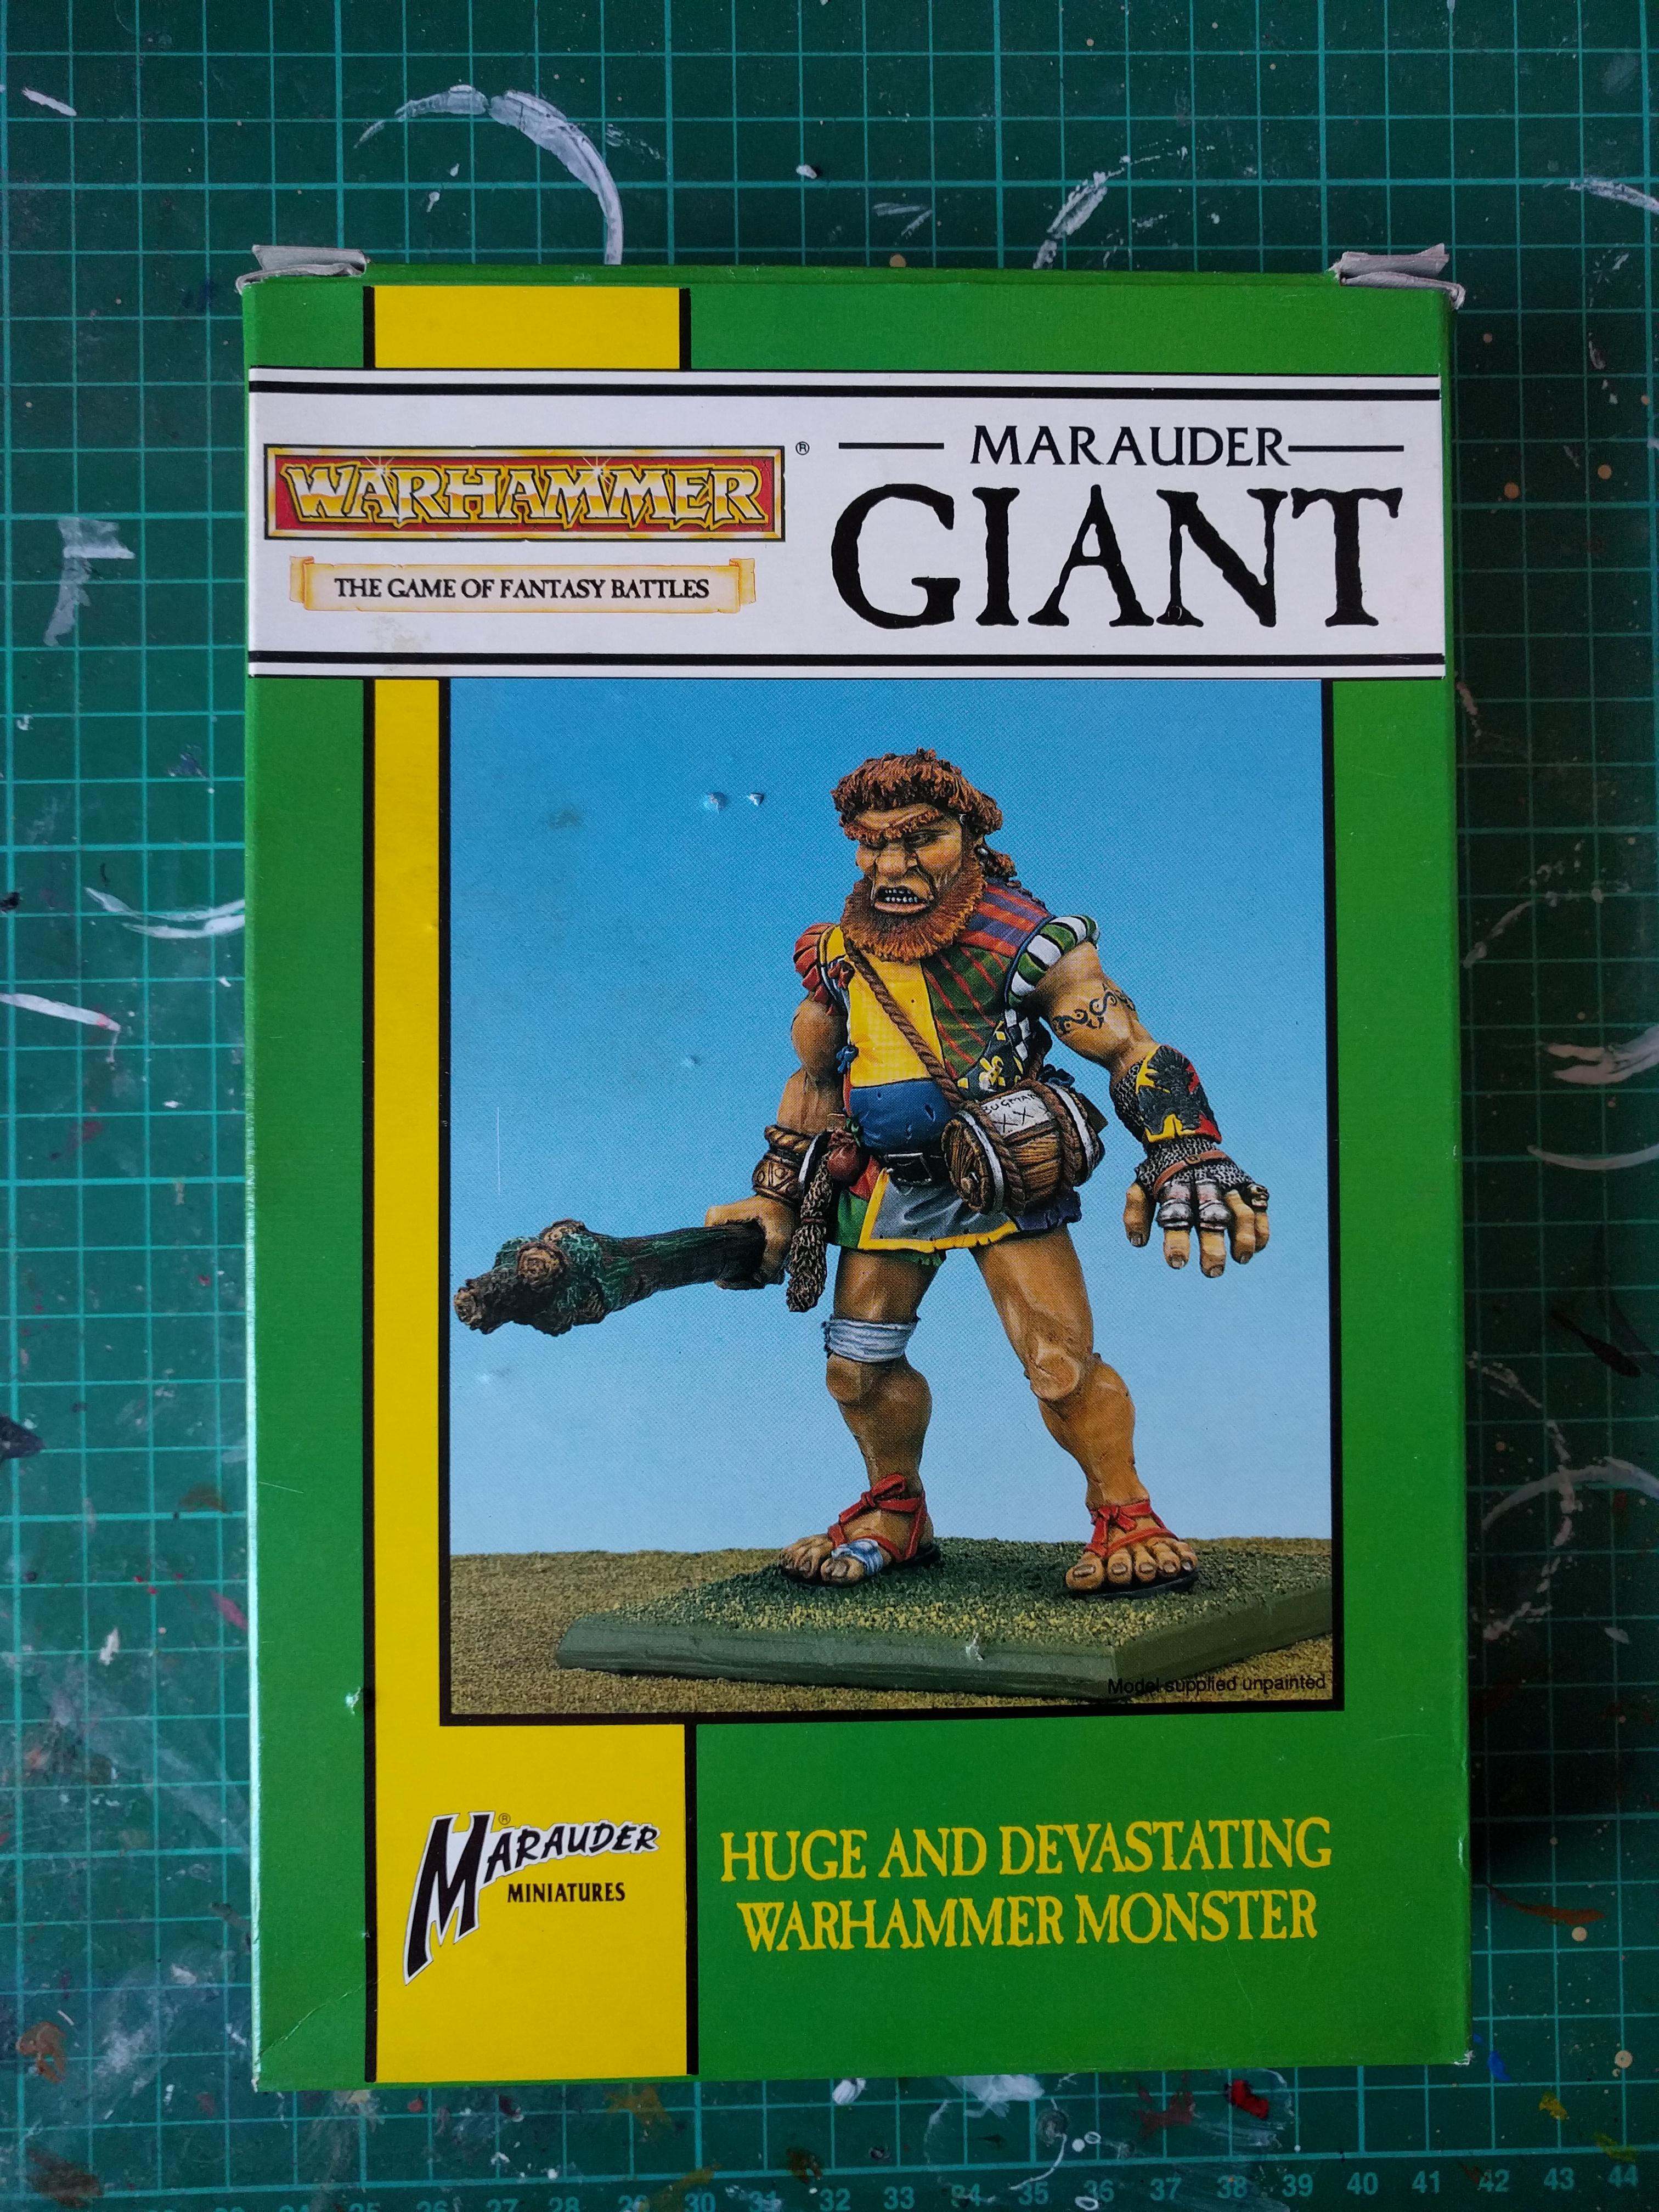 Marauder Giant